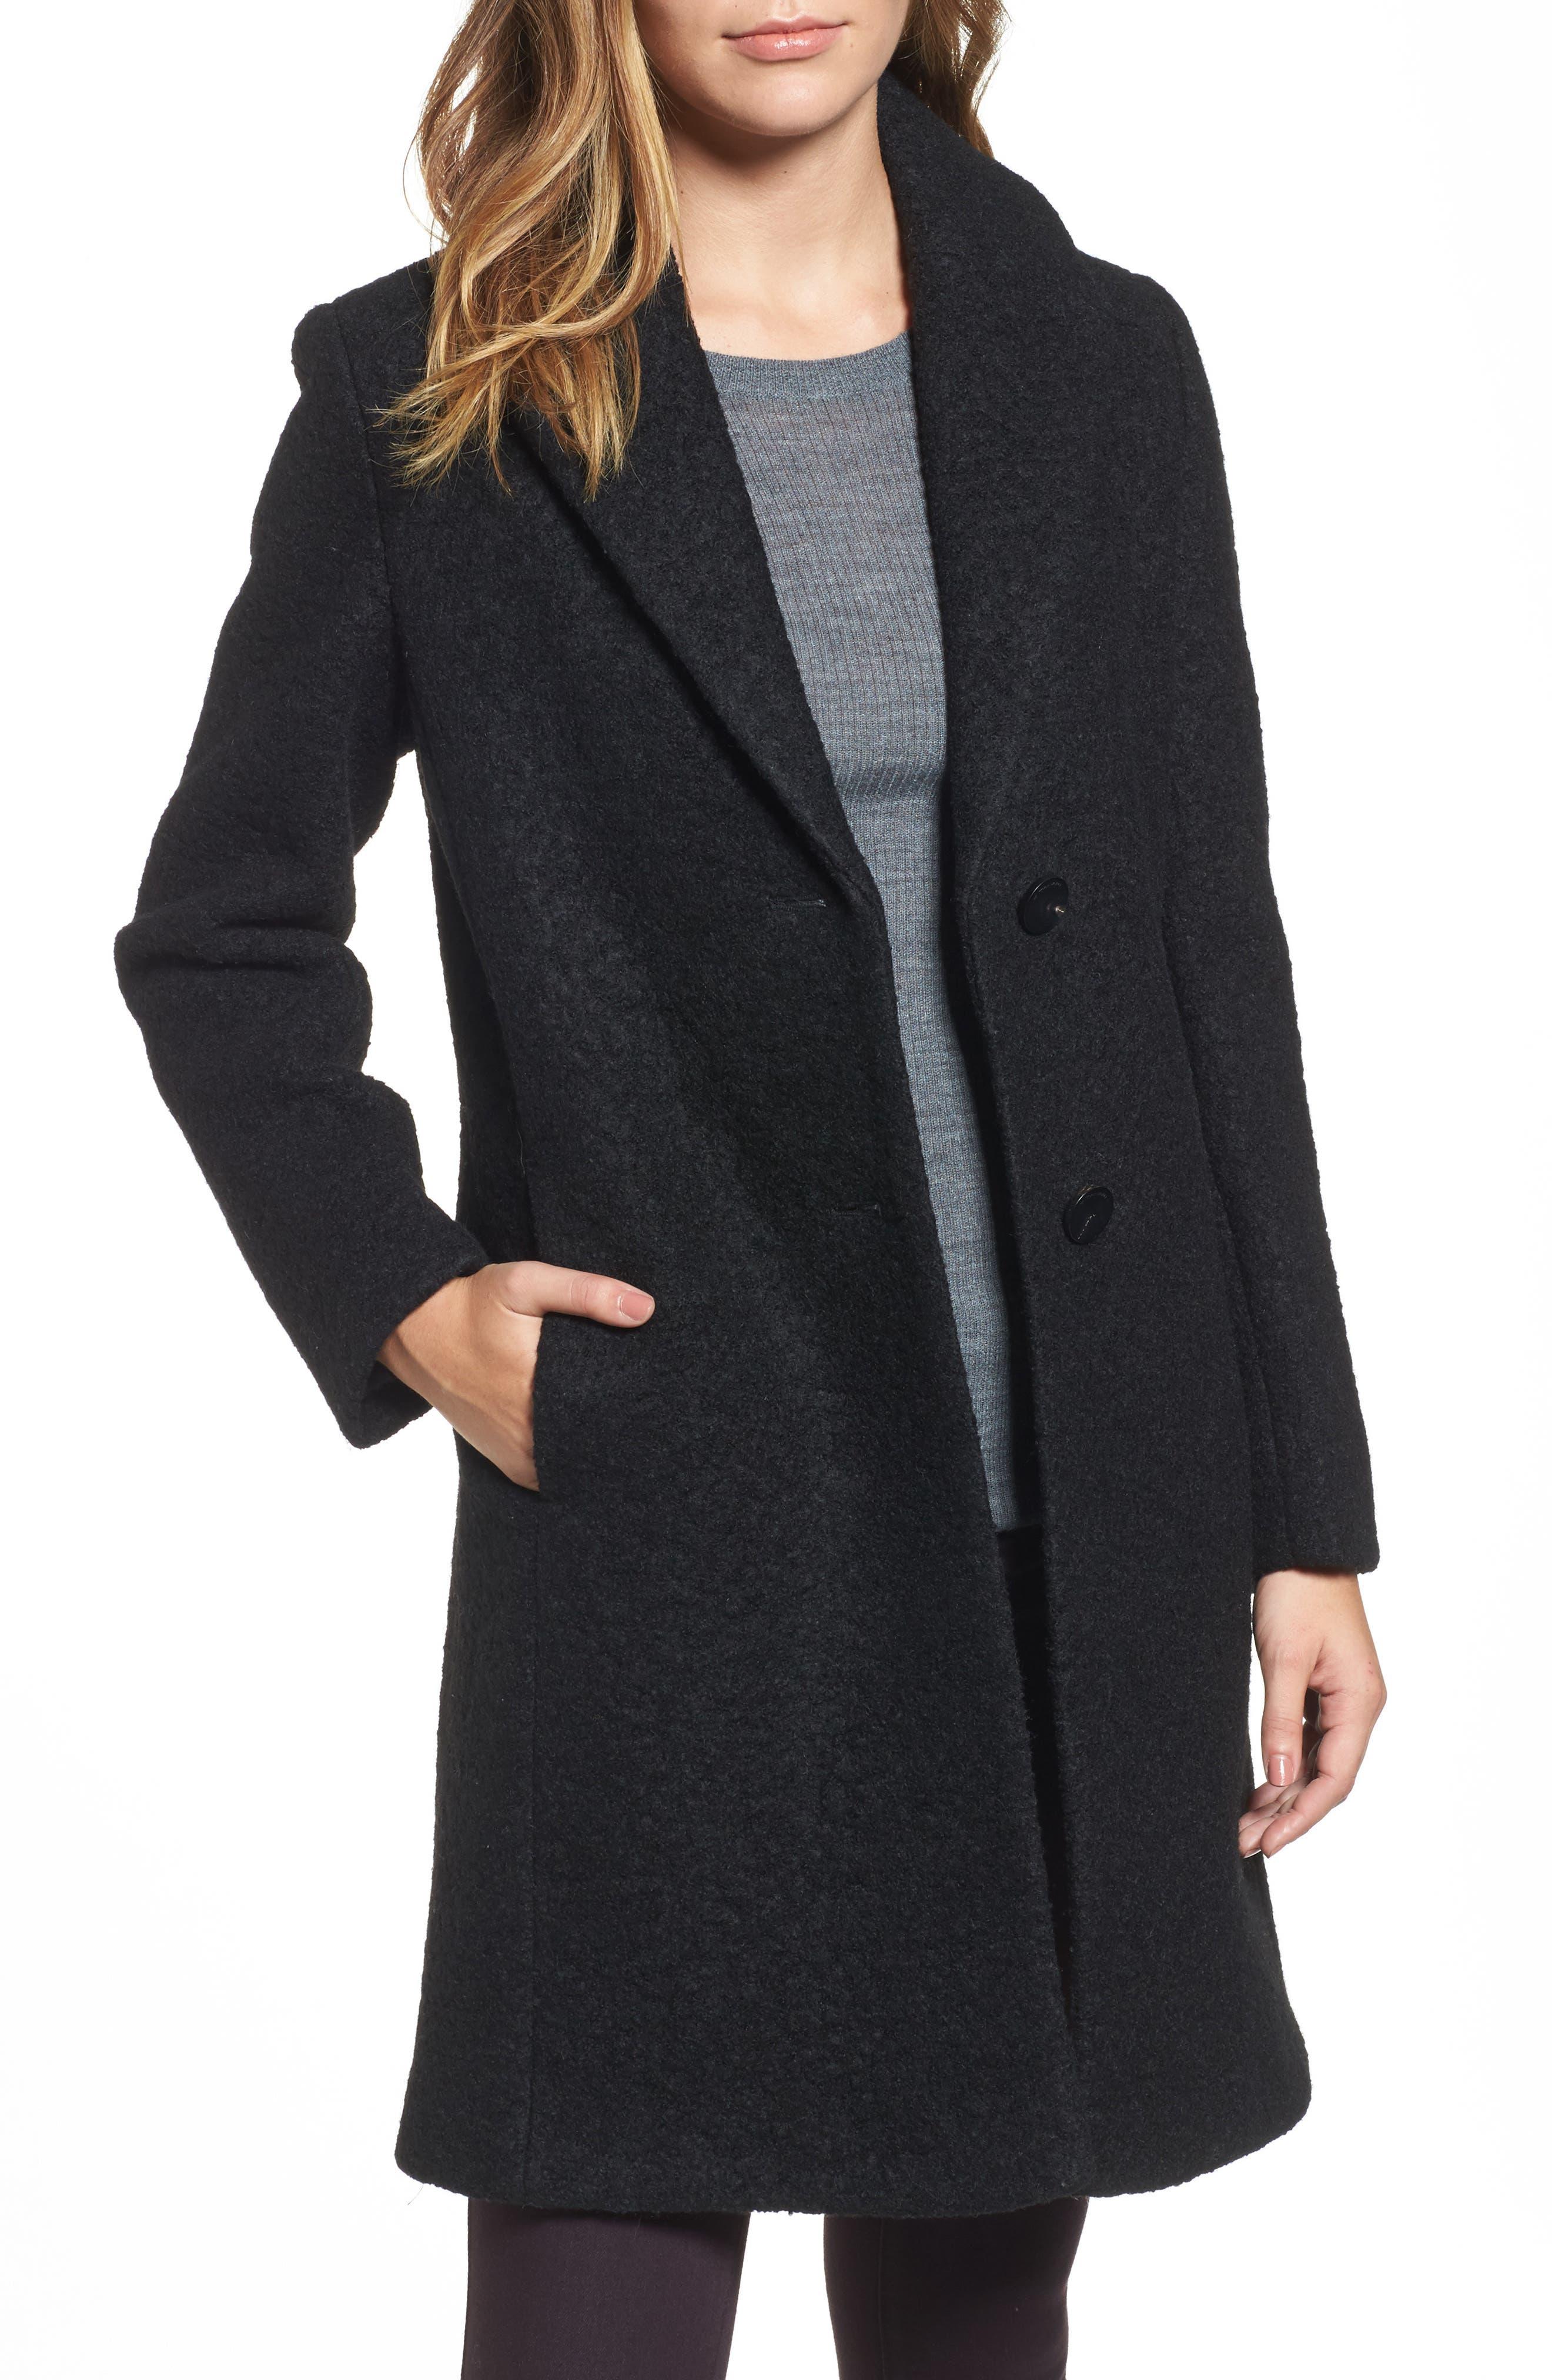 'Tessa' Boiled Wool Blend Coat,                         Main,                         color, 001